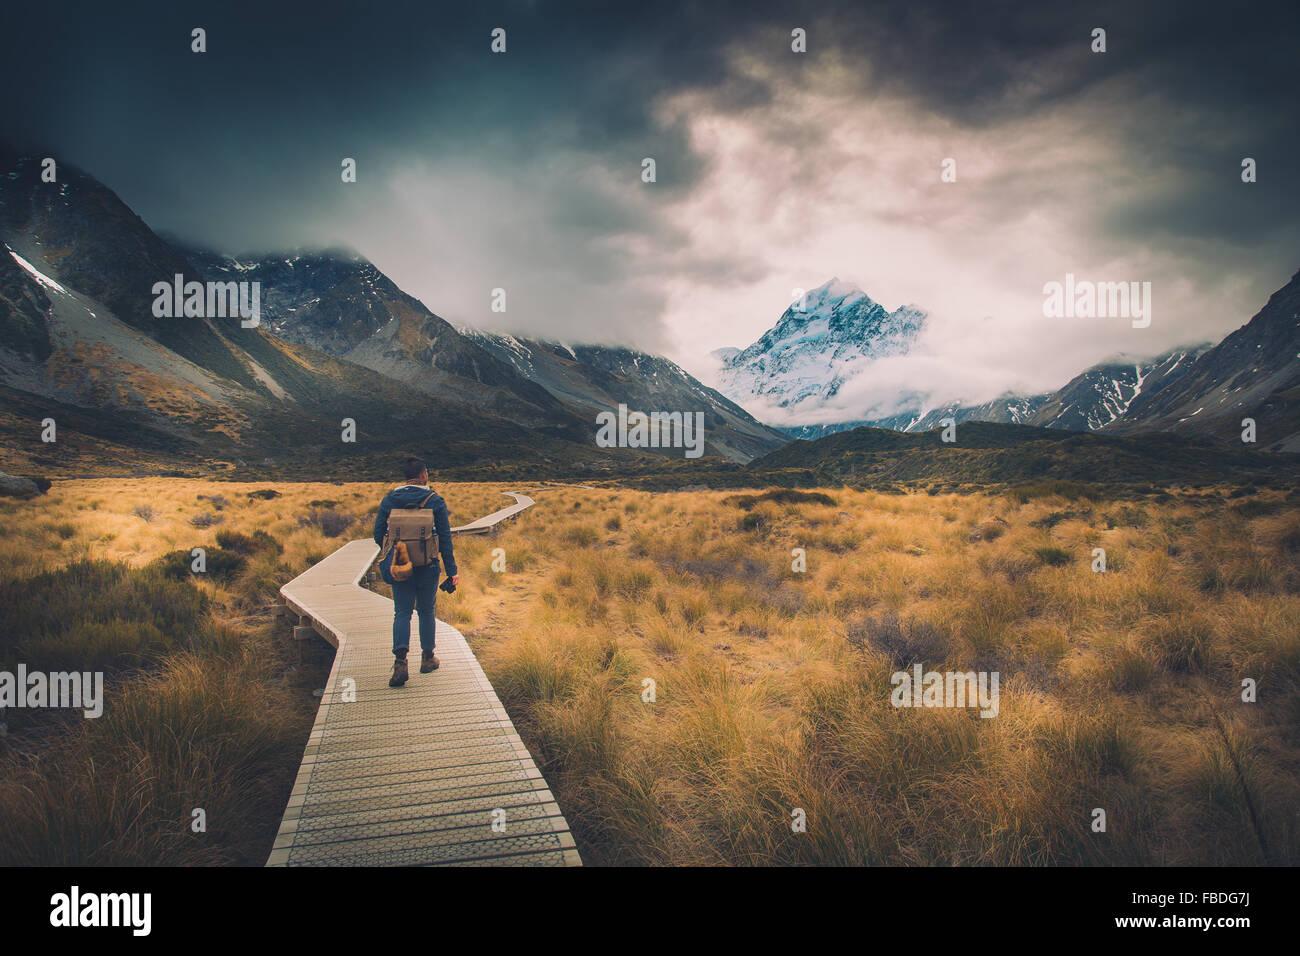 Man Walking On Path To Mountains - Stock Image